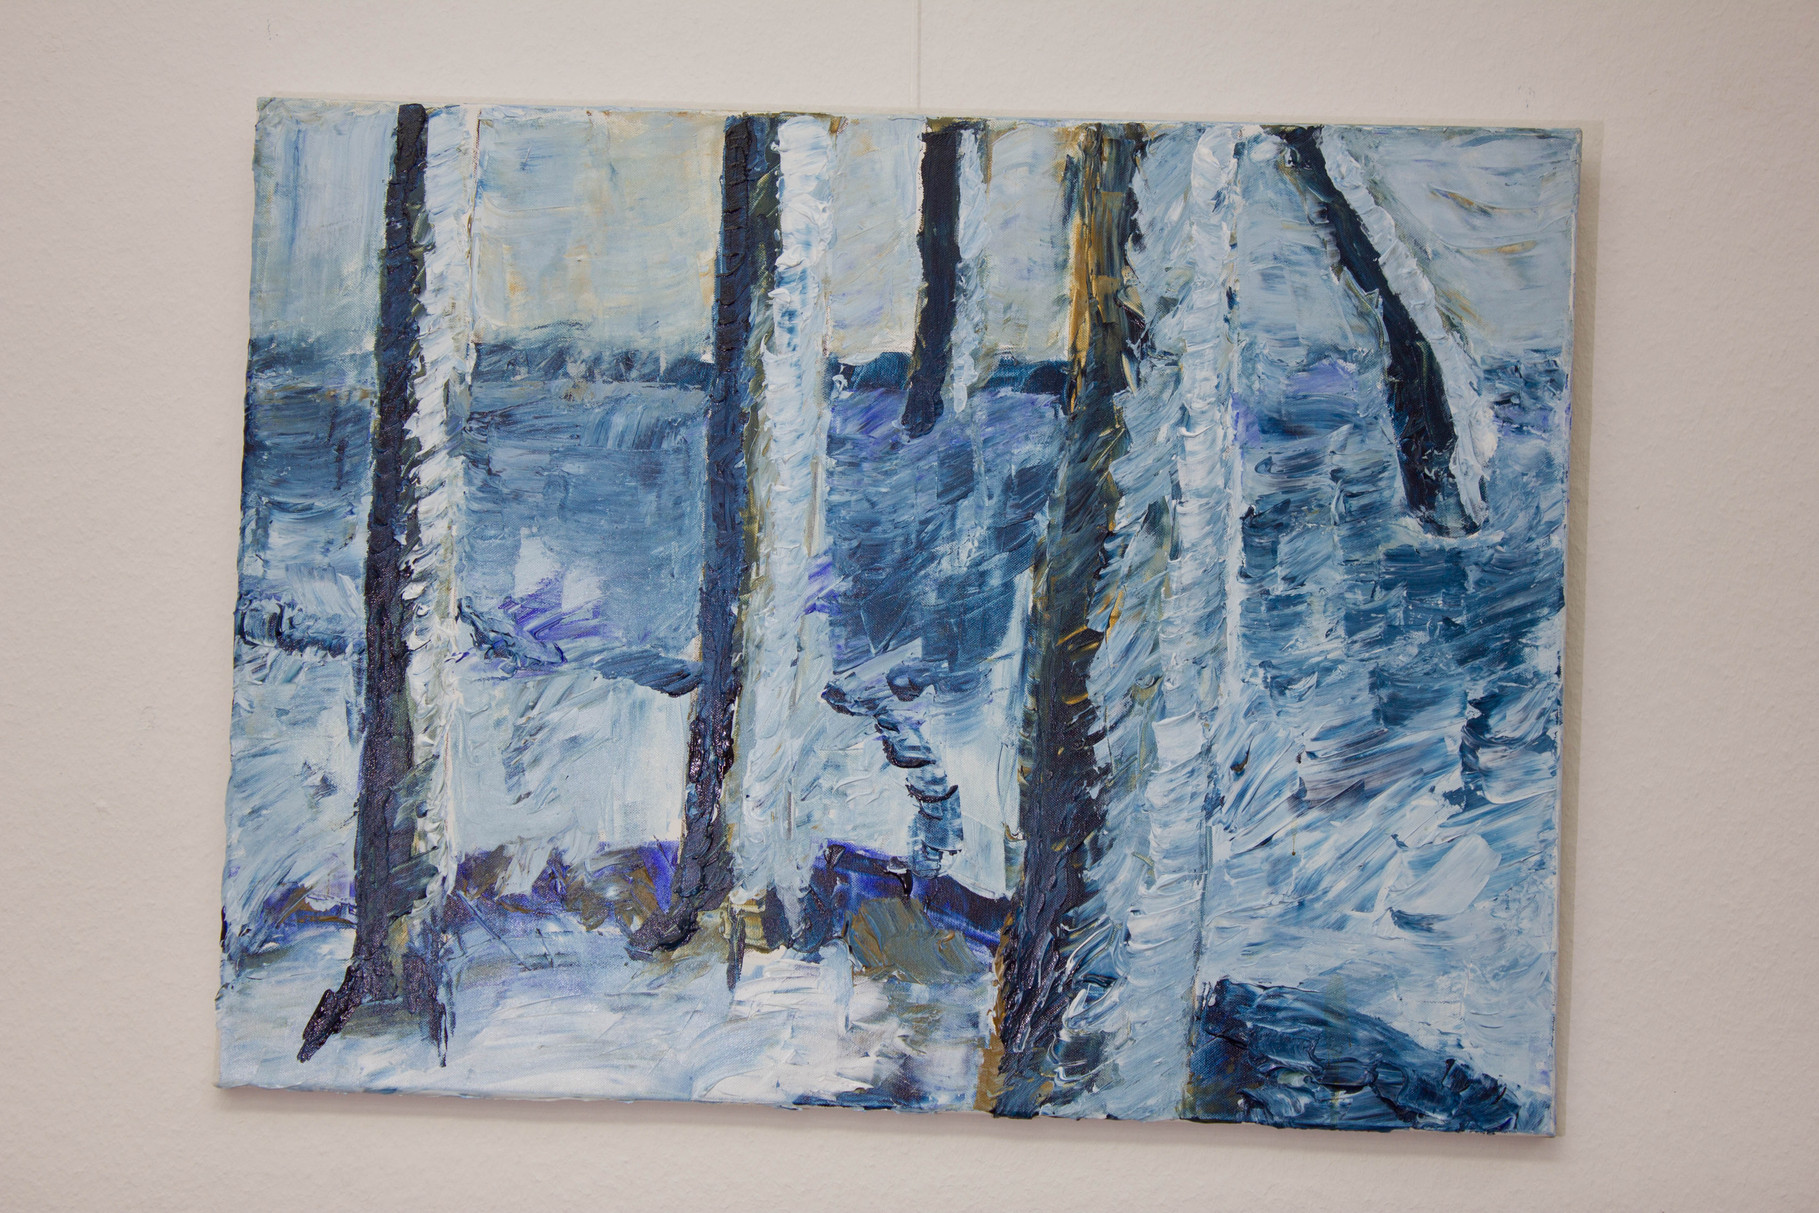 Nr. 6 Dietmar Krause, Acryl auf Leinwand